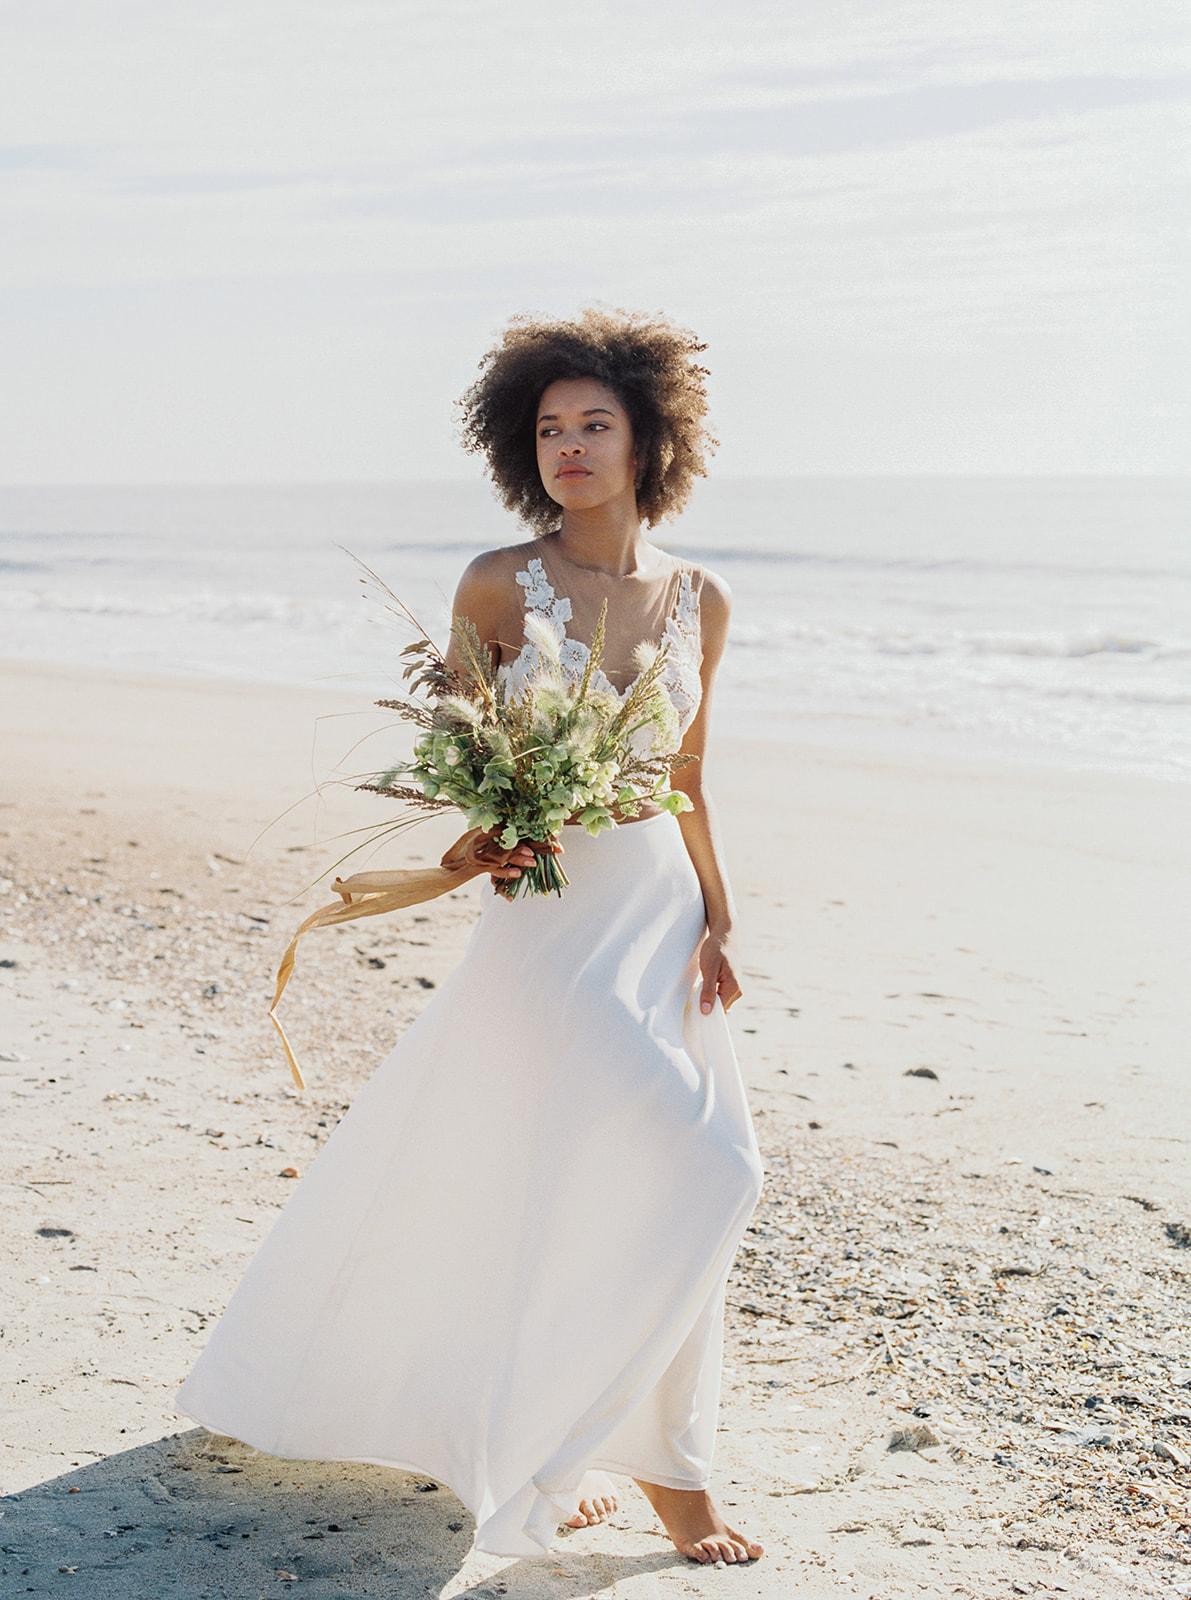 hannah-michelle-photography-atlanta-wedding-photographer-19.jpg